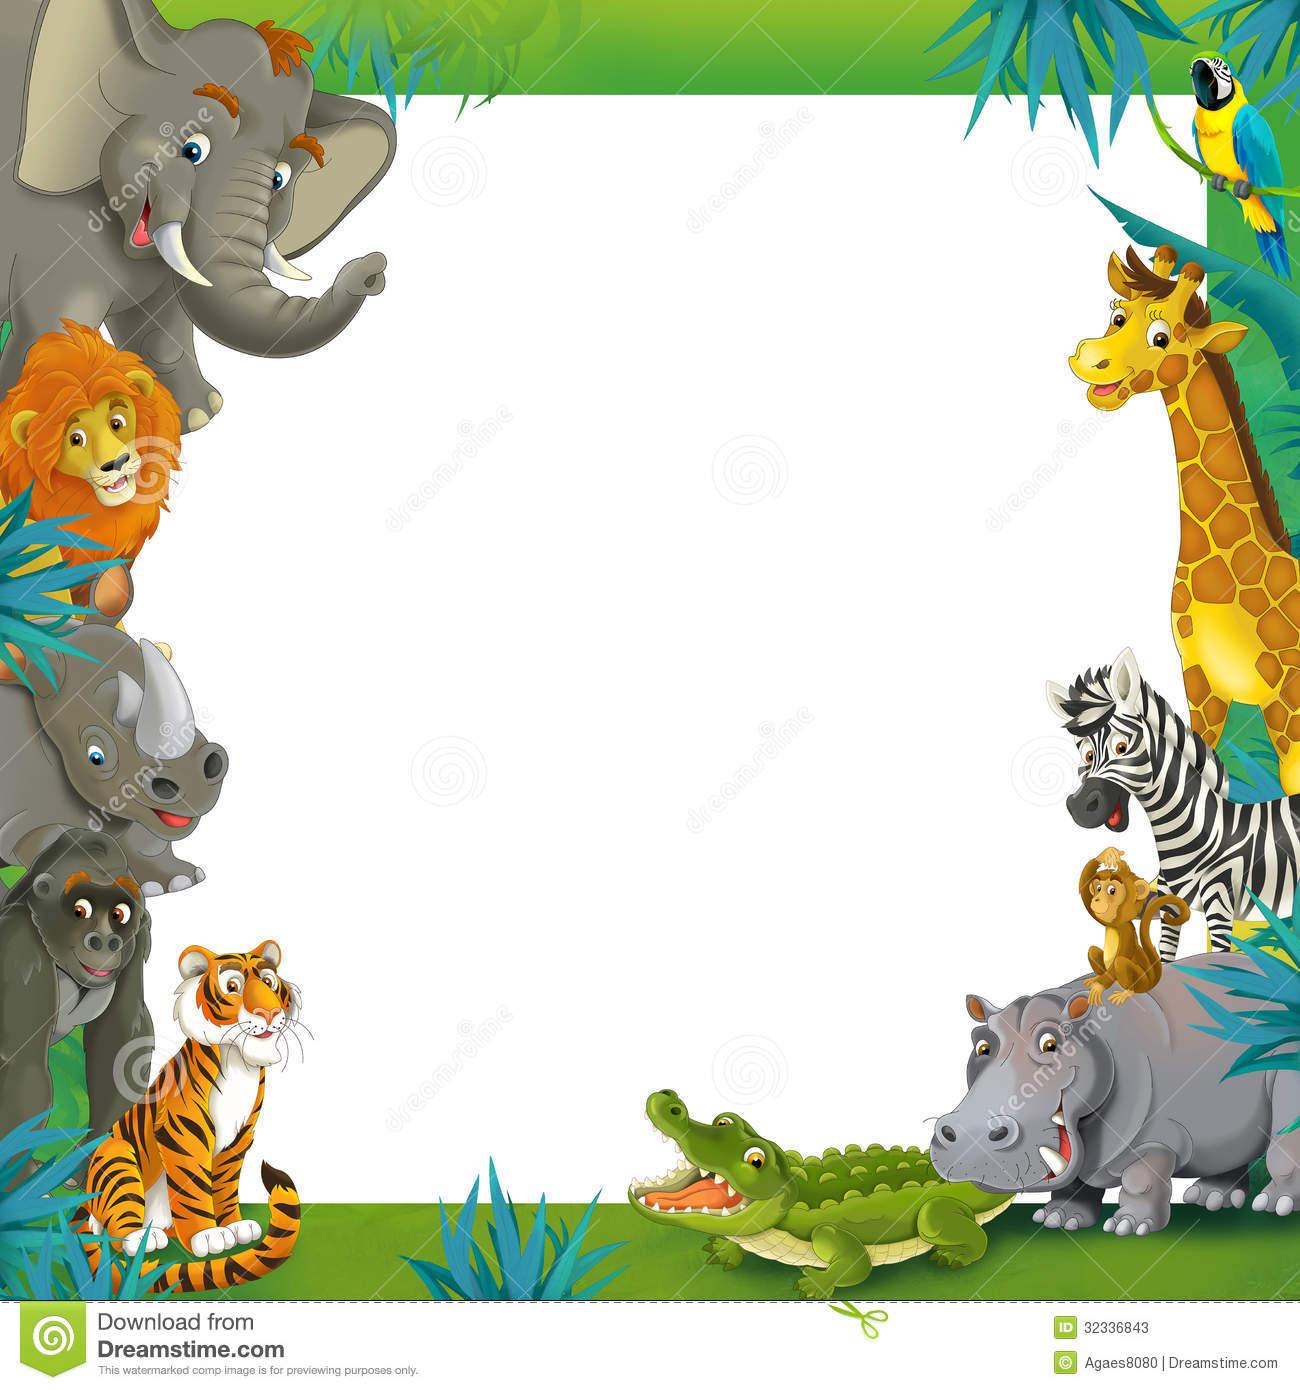 Jungle Frame Clipart.